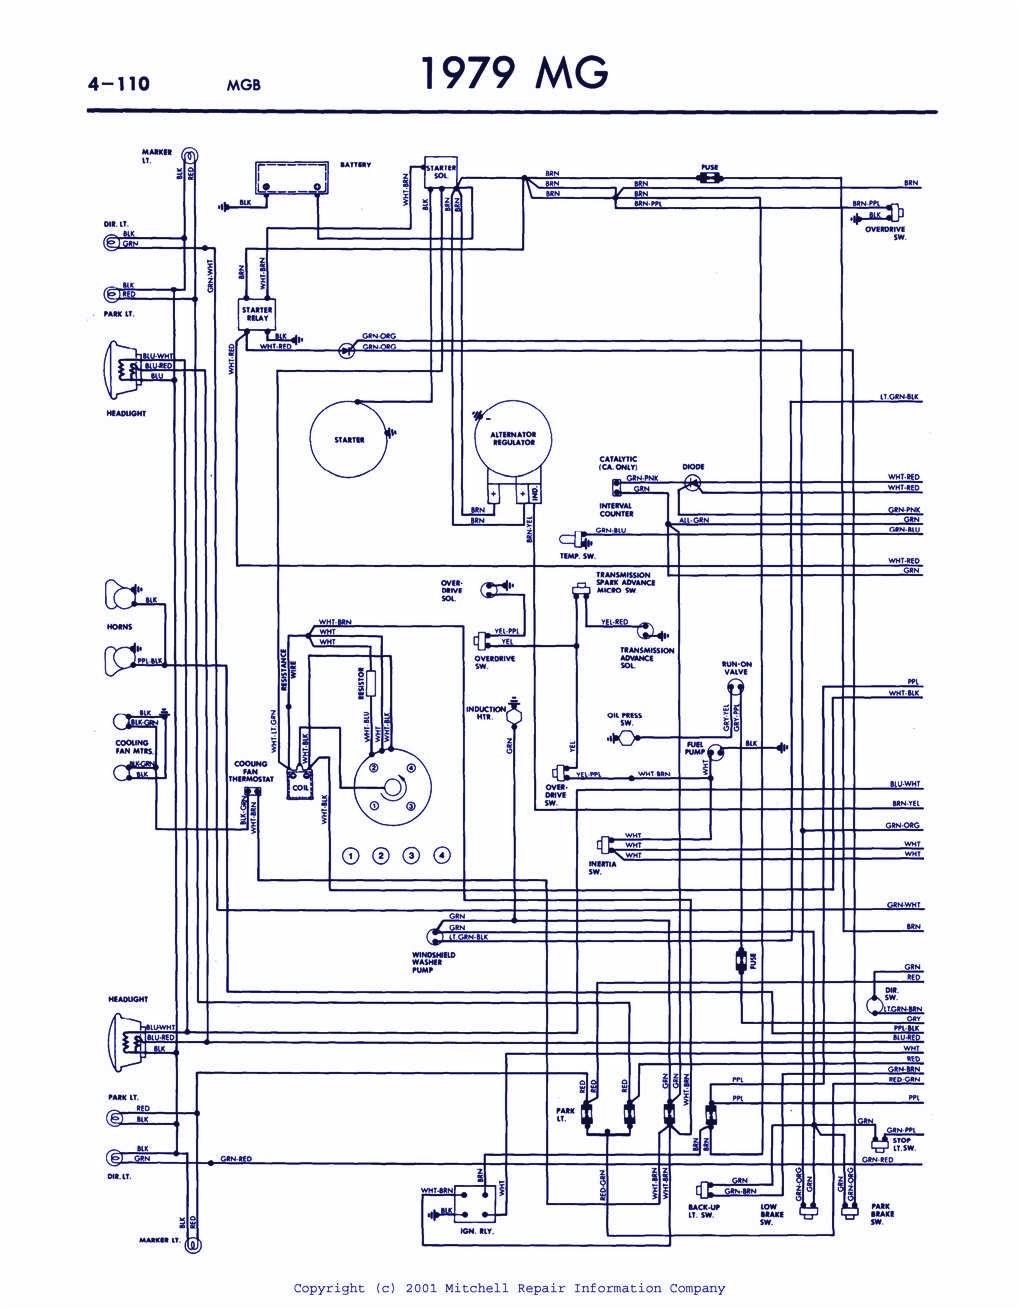 mg wiring diagram elegant 1976 mgb wiring diagram od wire center e280a2 of mg wiring diagram jpg